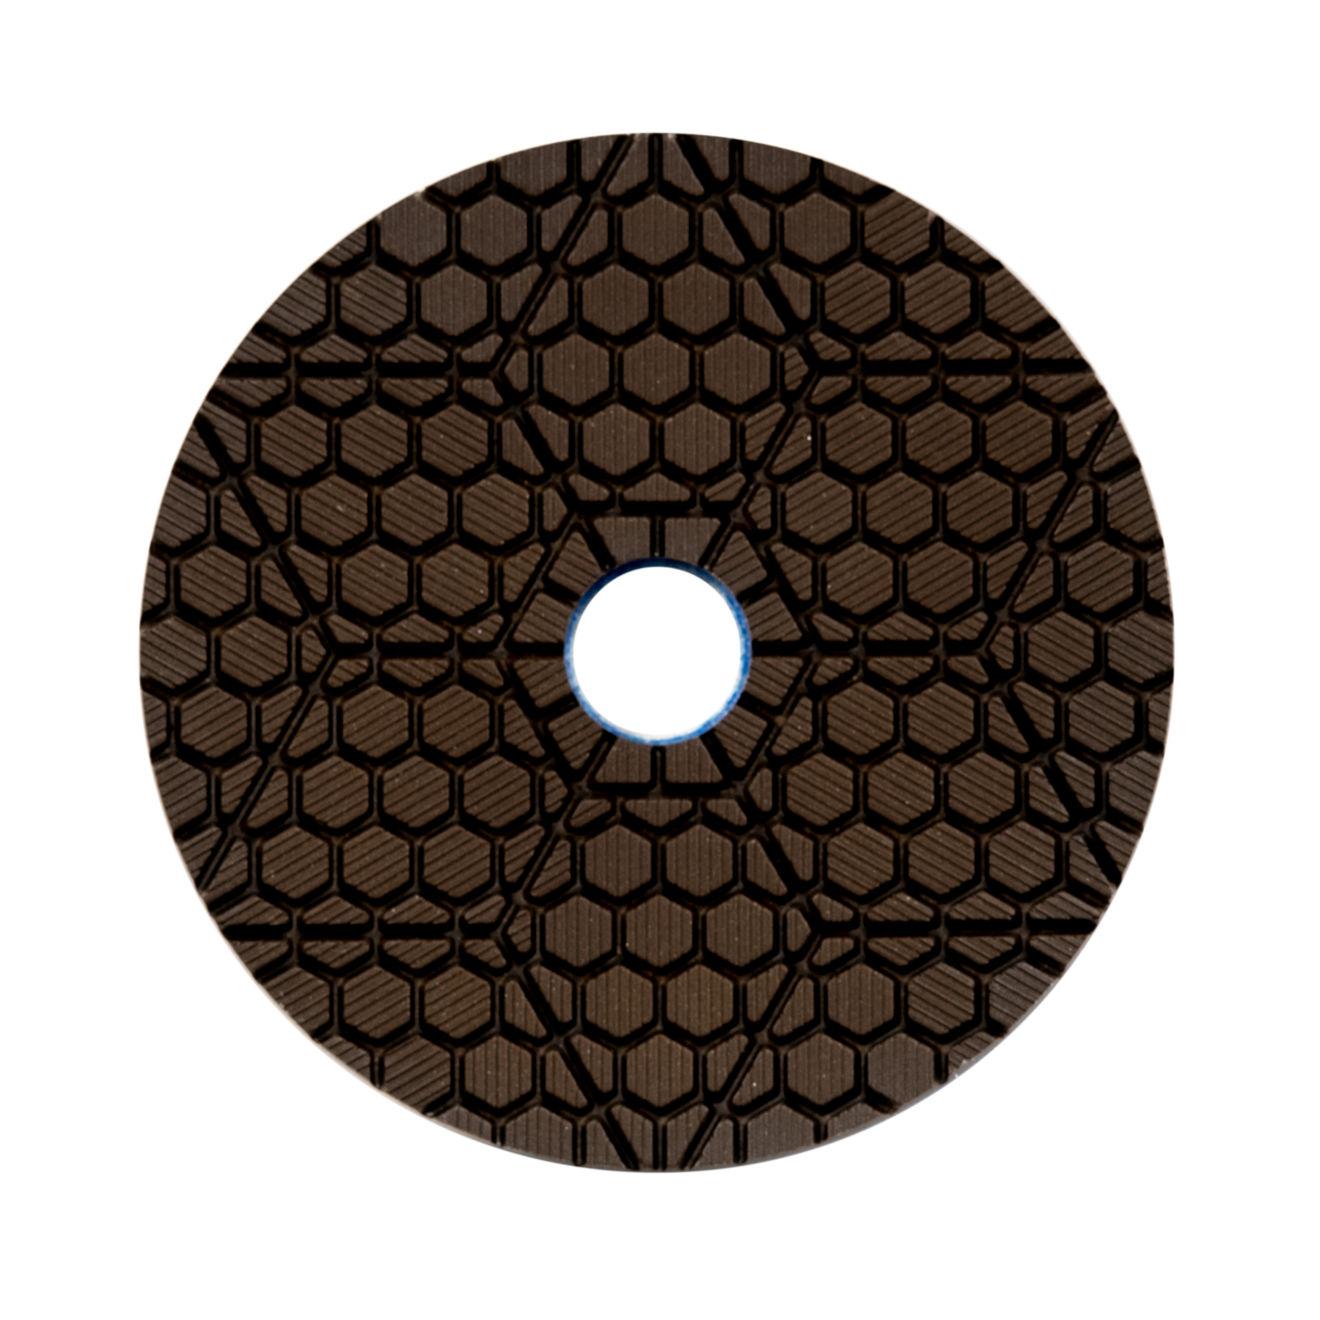 "ODYN Premium Wet Stone Polishing Pad 4"" x 5/8"" - 50 Grit"